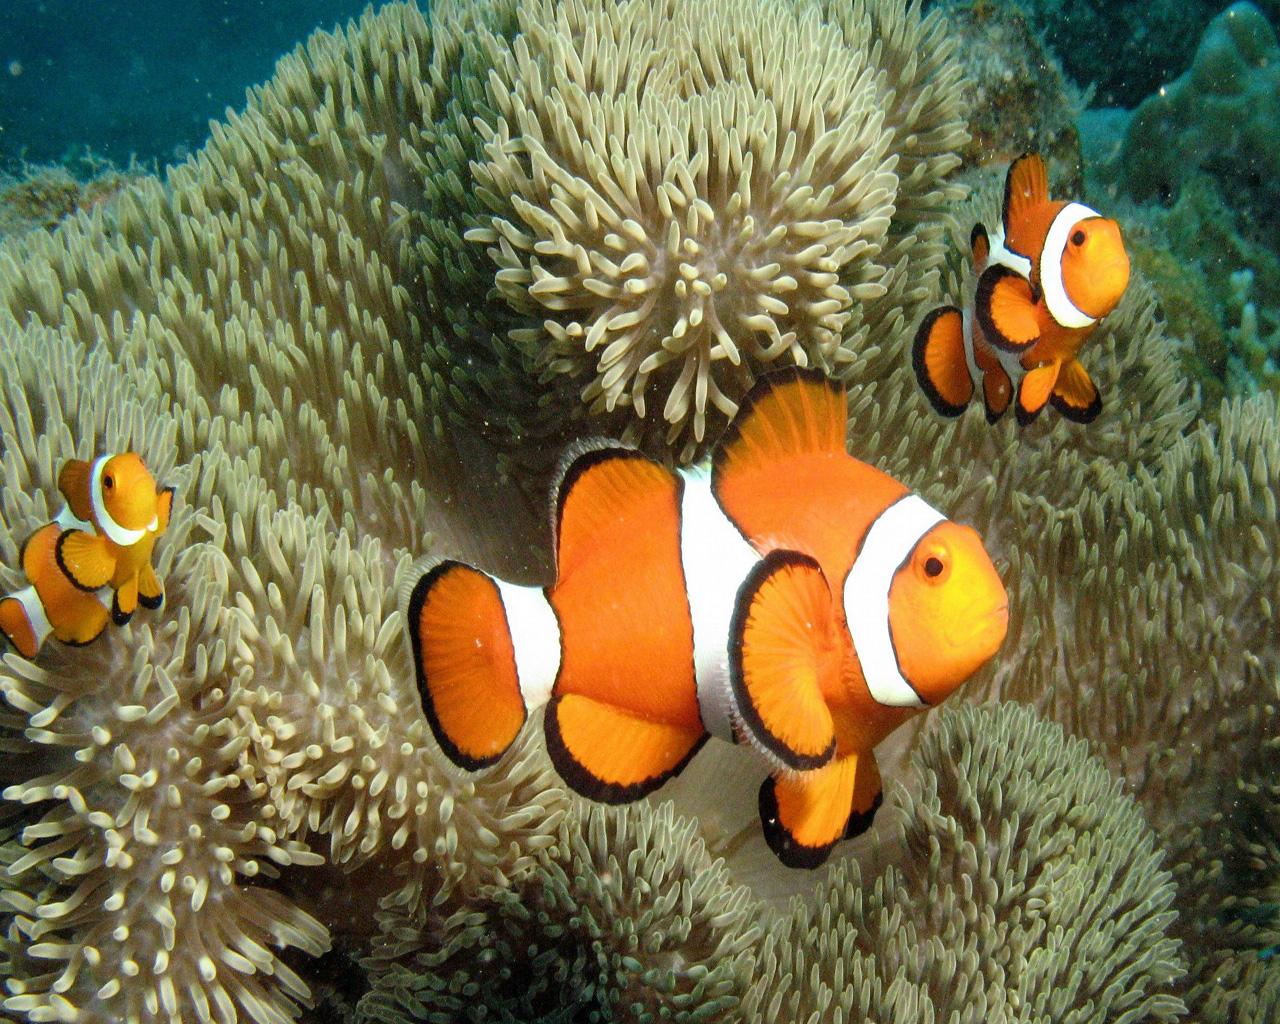 Clown fish - photo#12